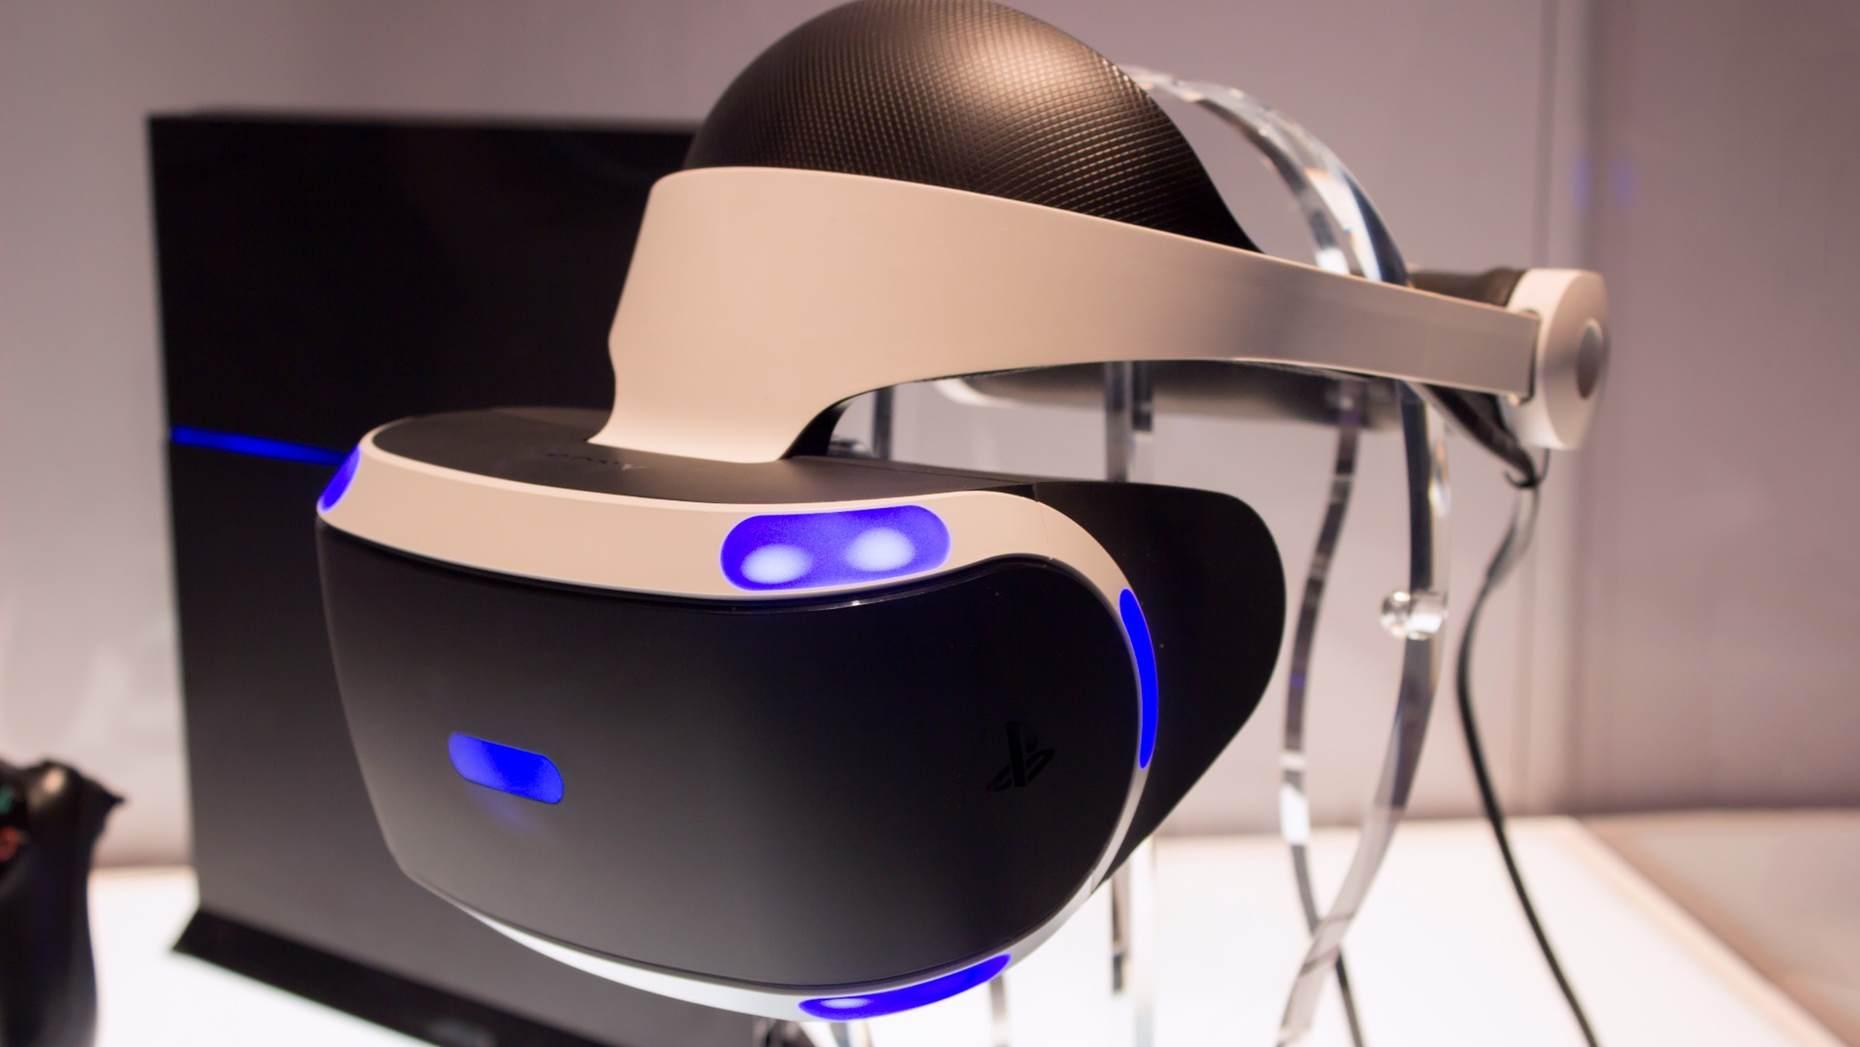 PS VR 以 PlayStation 4 作为主机。/图片来自 Gizmag